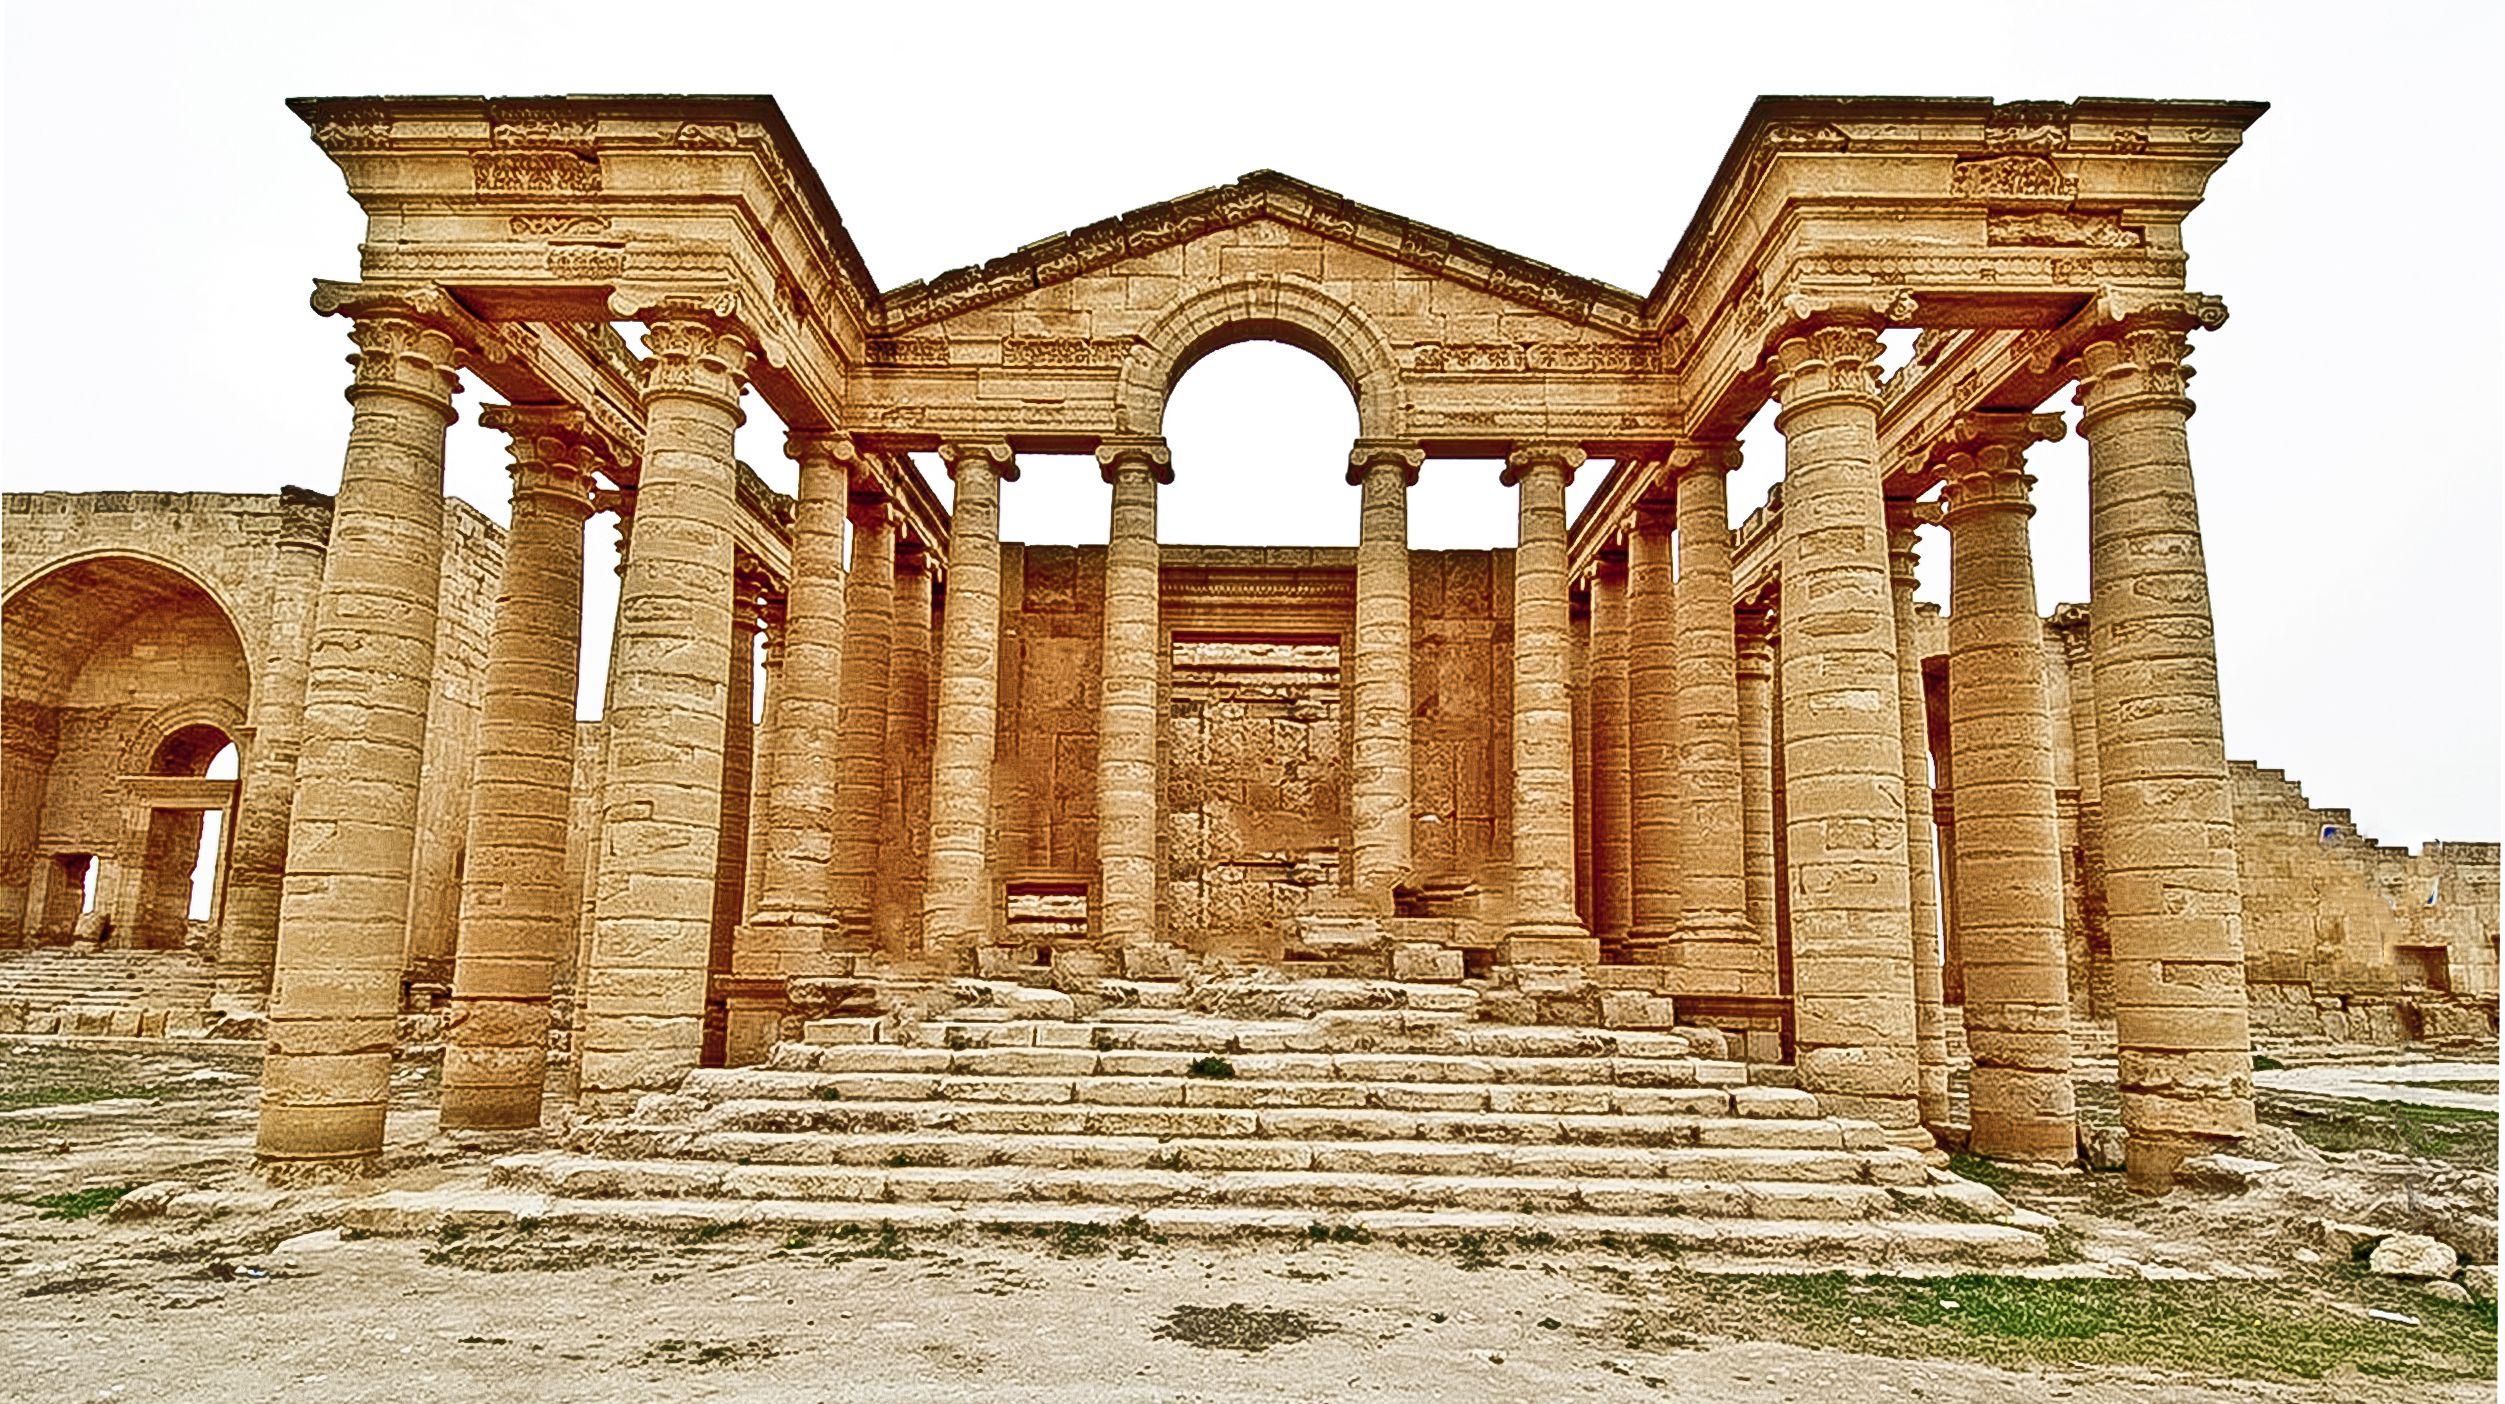 Mesopotamia: the architecture of the ancient civilization